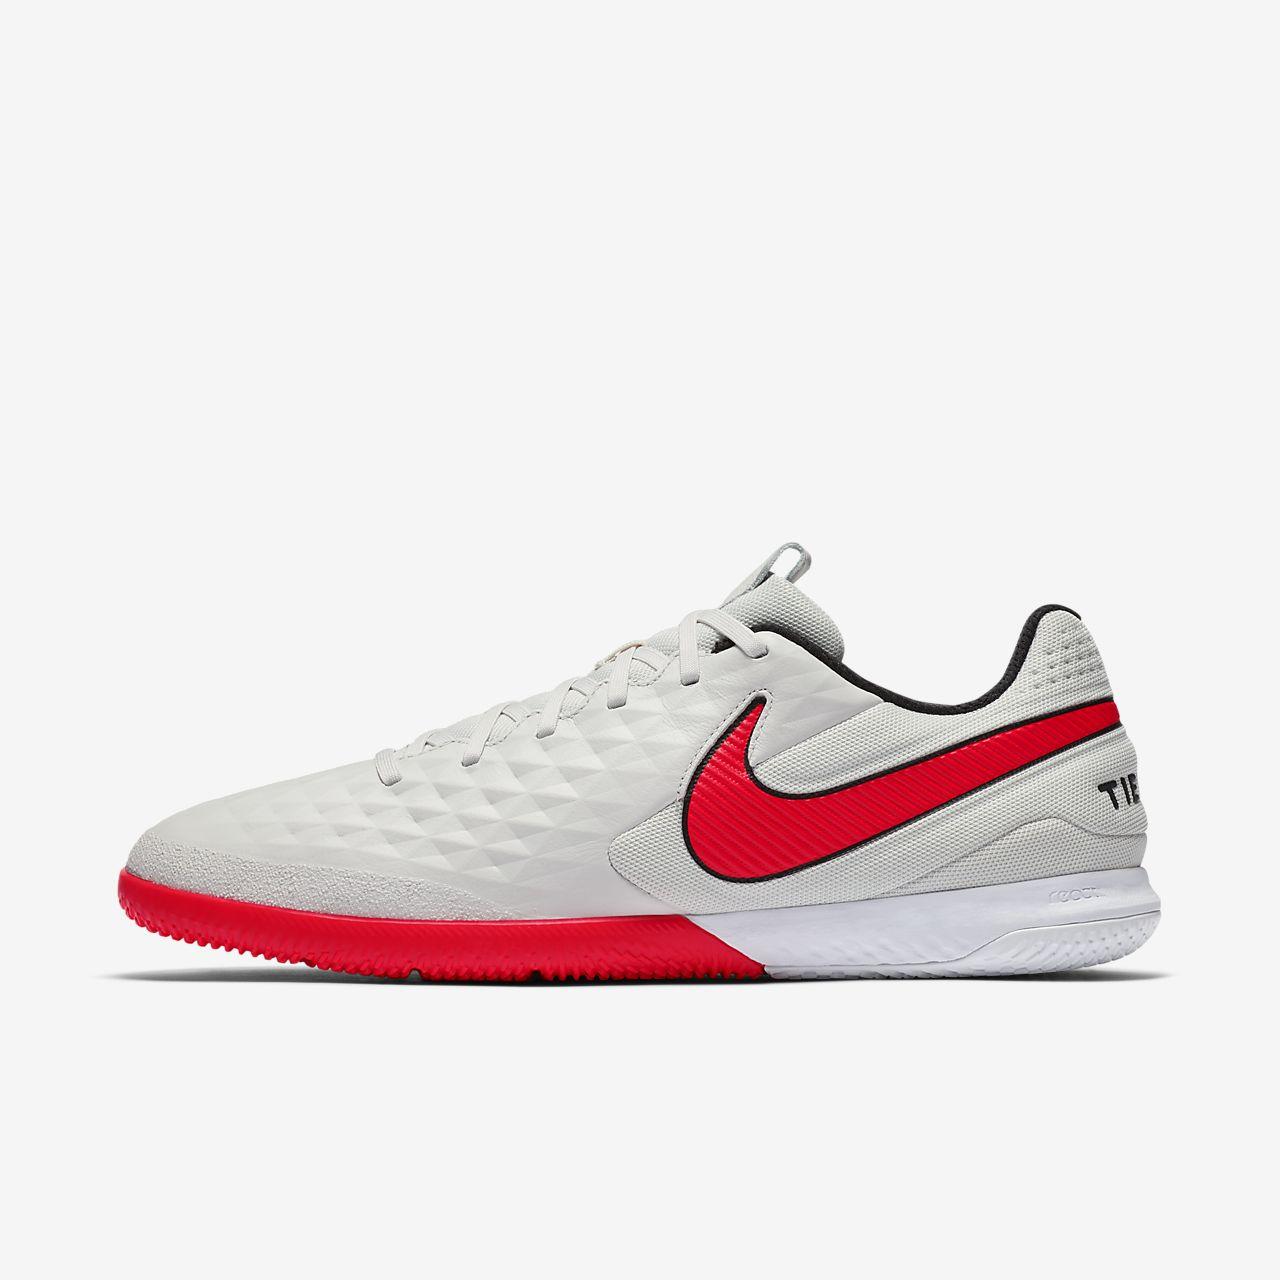 Sapatilhas de futsal Nike React Tiempo Legend 8 Pro IC